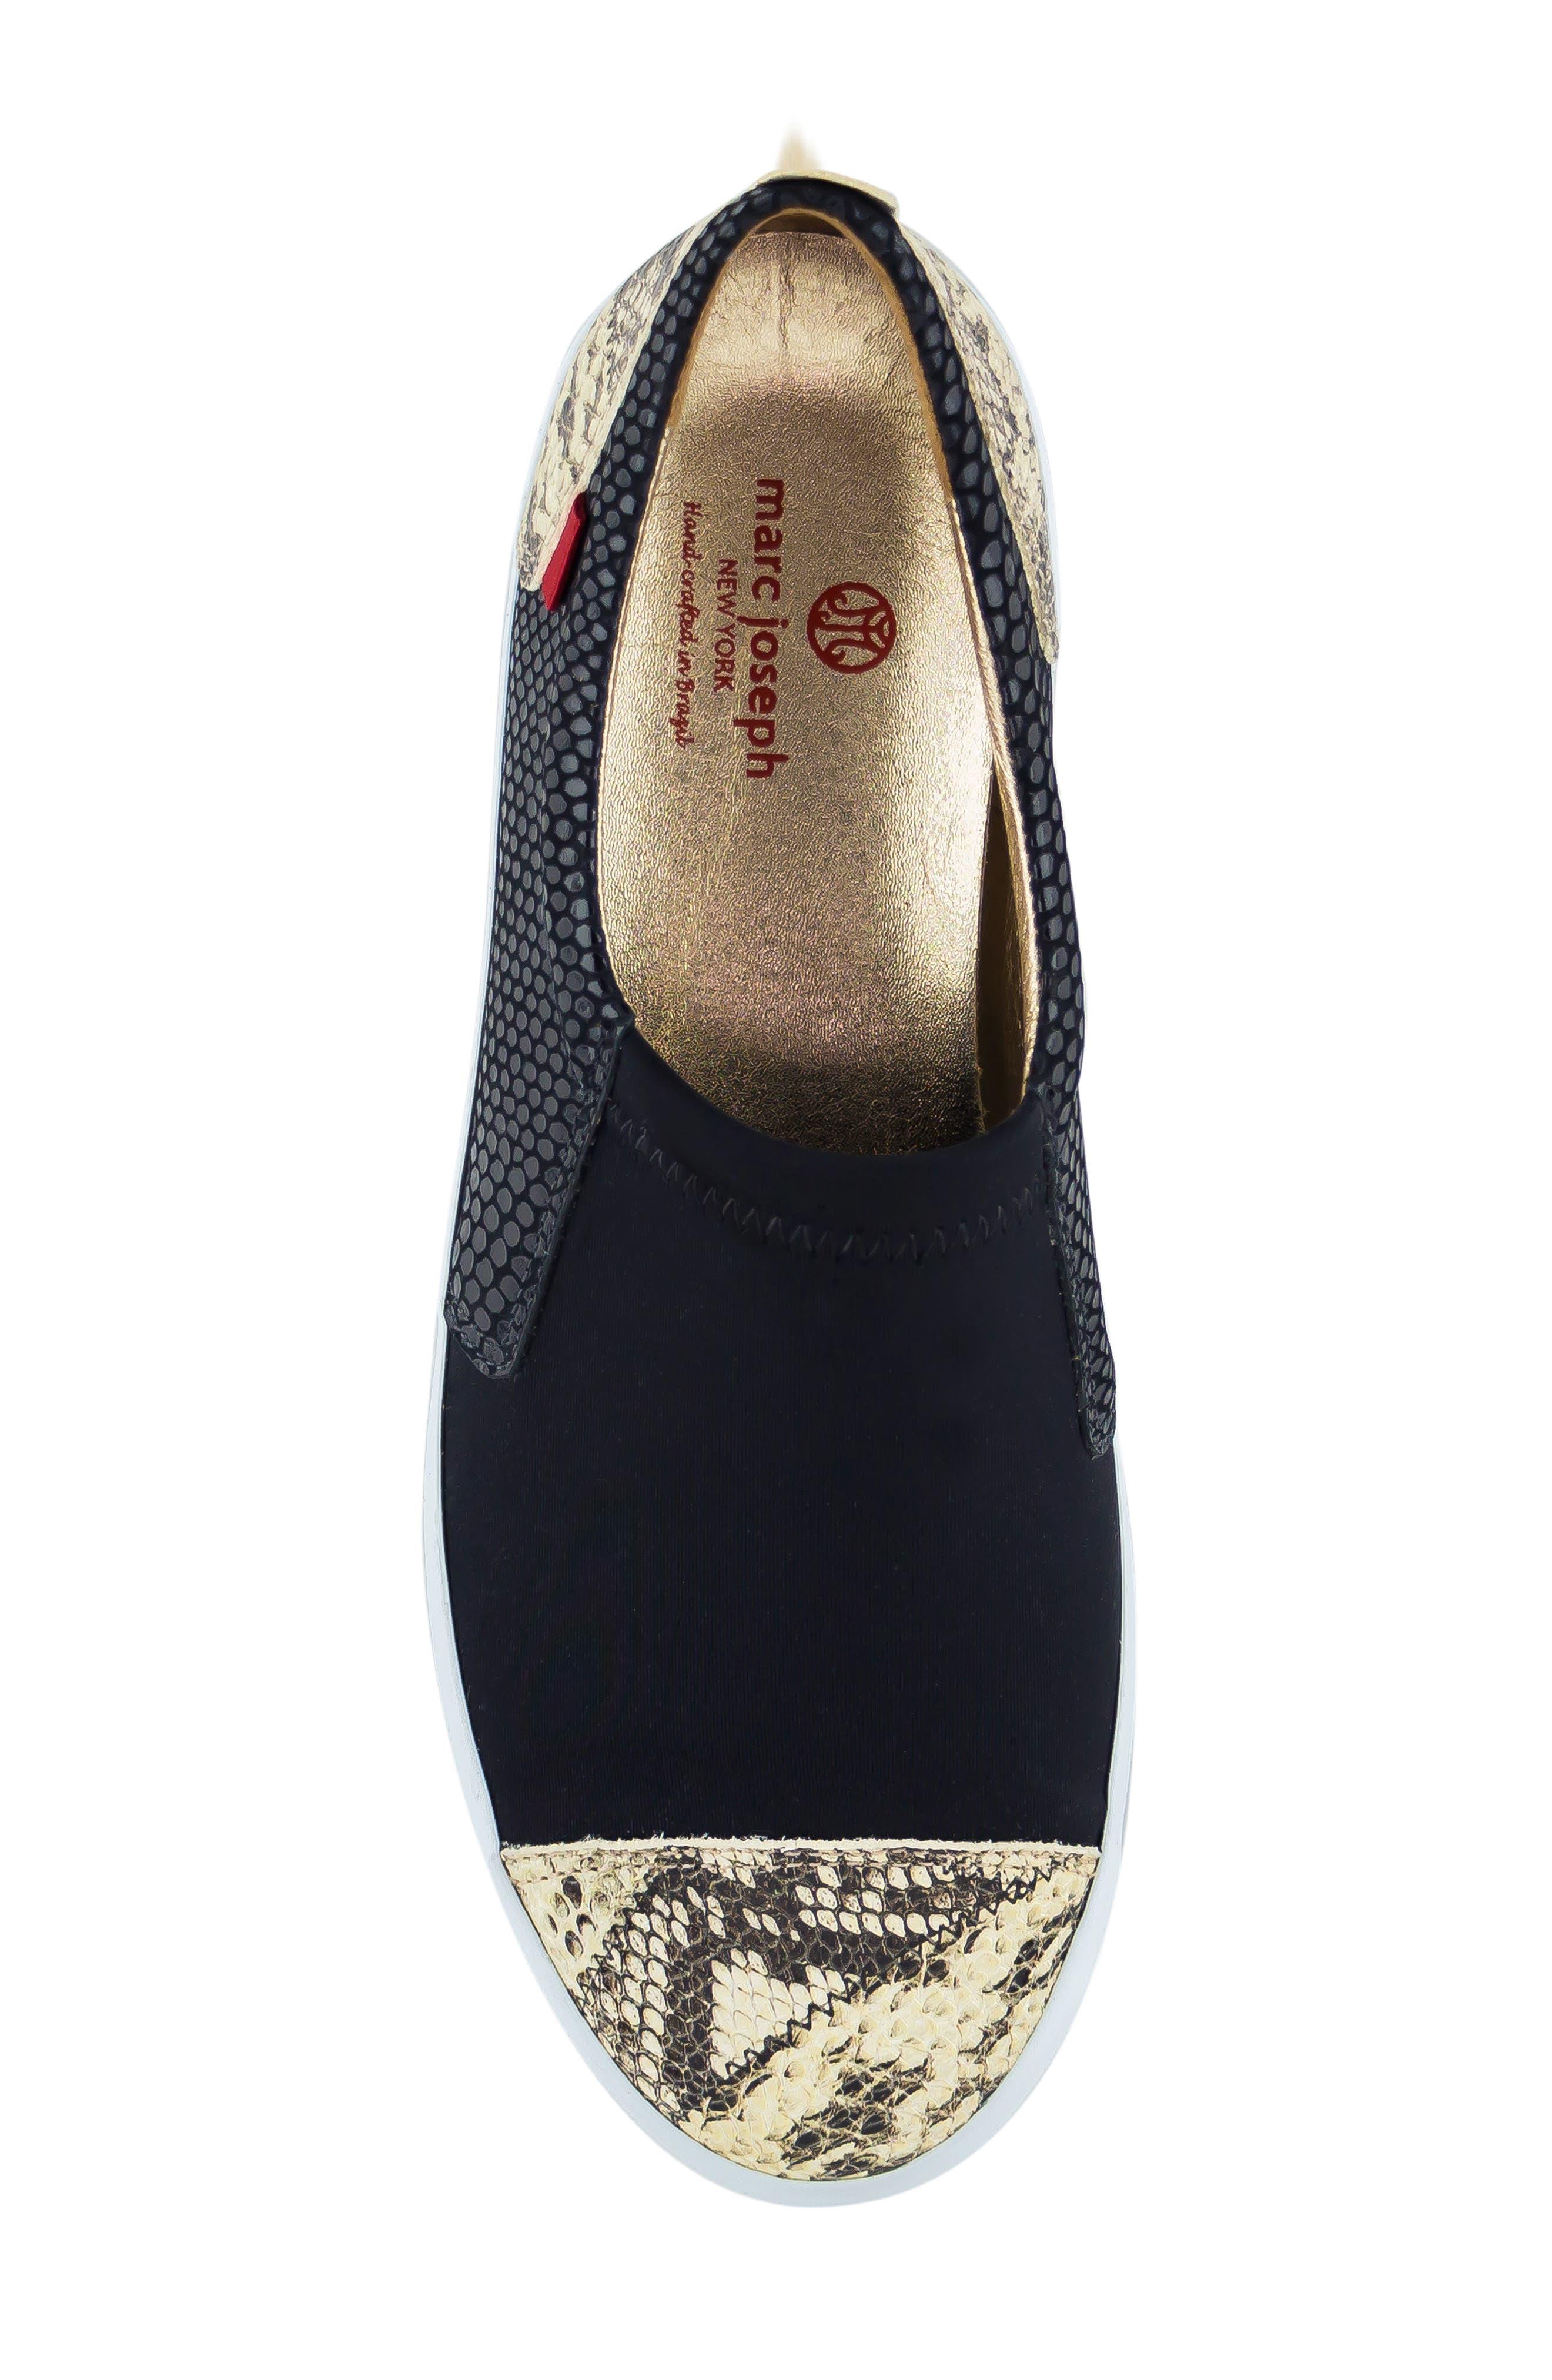 MARC JOSEPH NEW YORK, Jay Street Sneaker, Alternate thumbnail 5, color, BLACK PATCHWORK